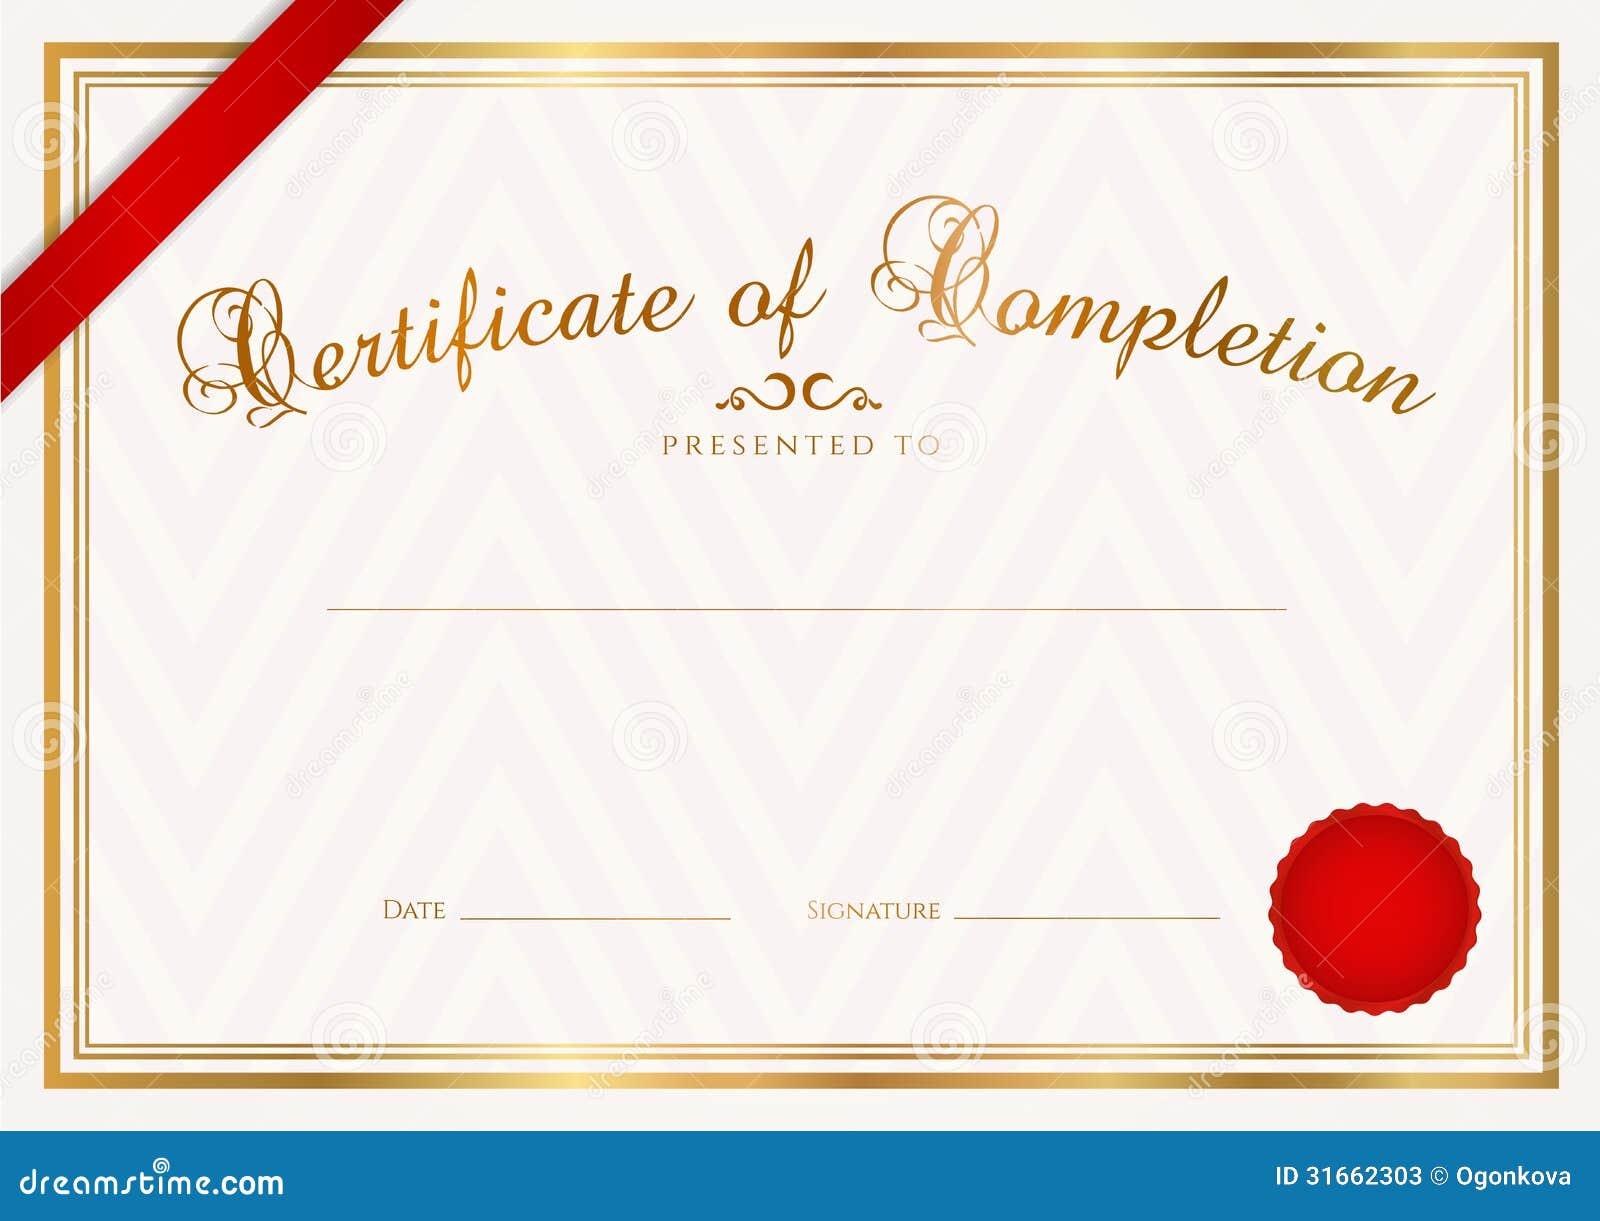 fondos para diplomas - Ideal.vistalist.co